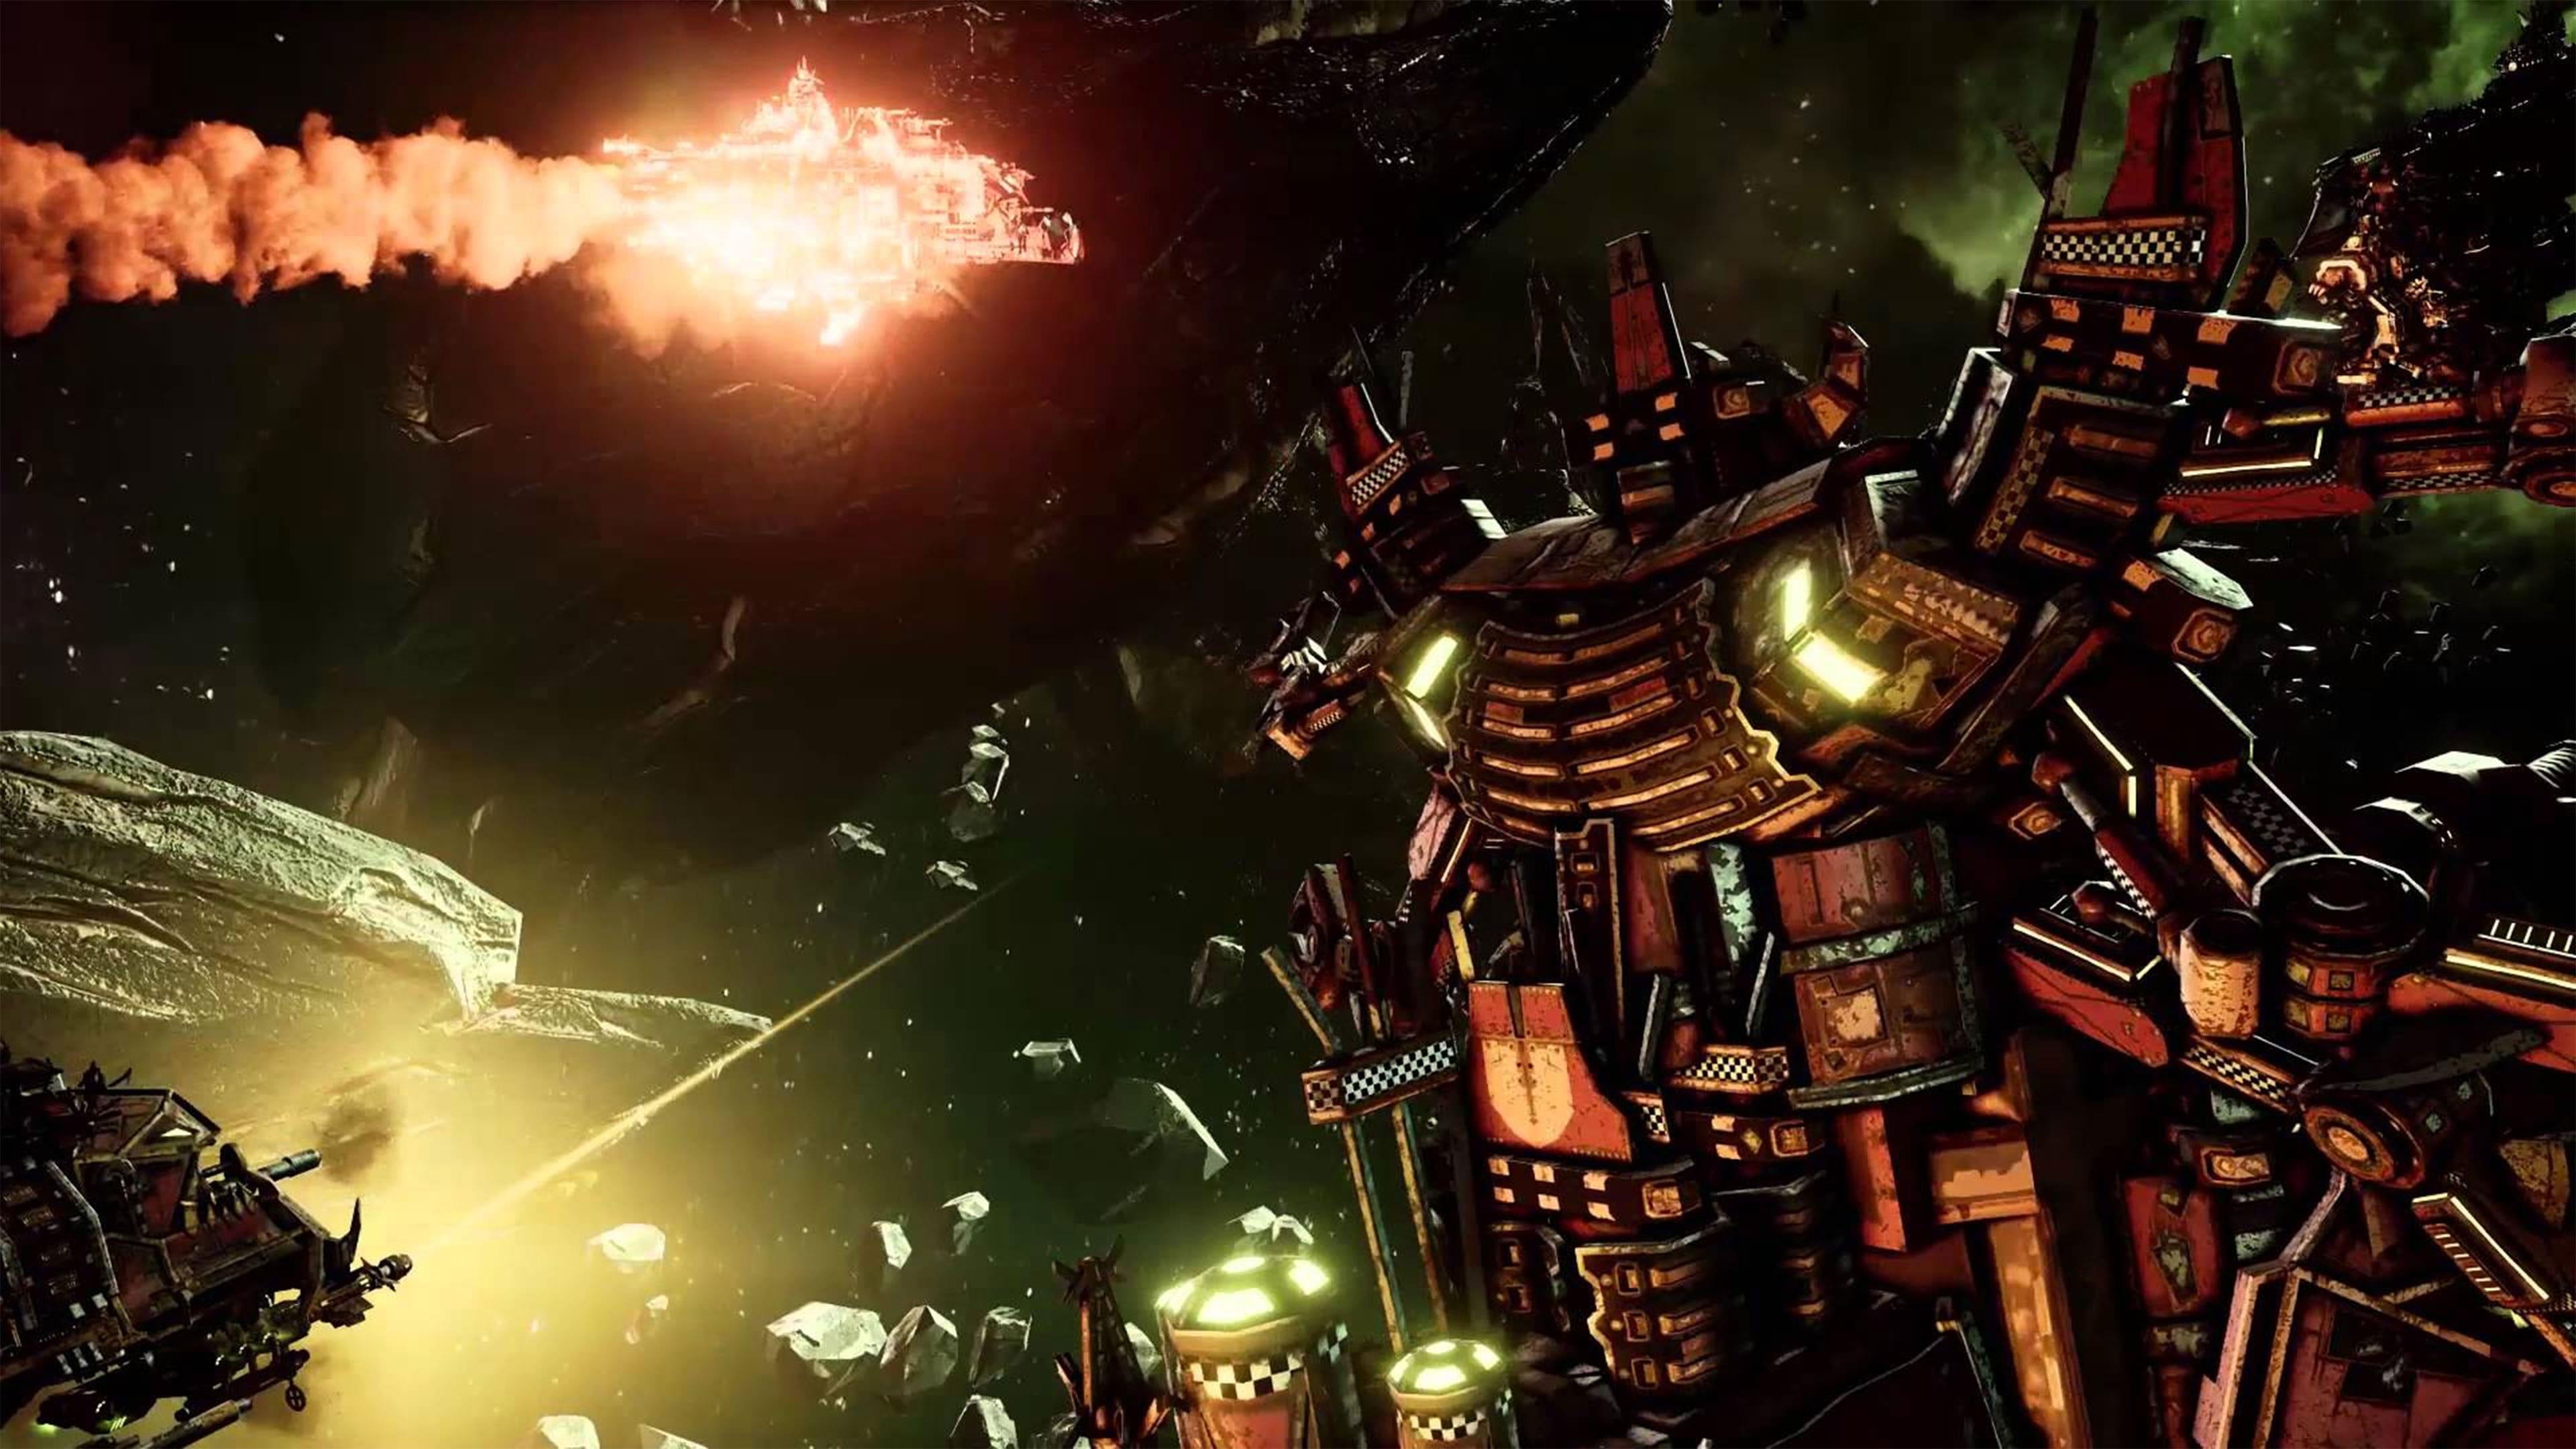 Battlefleet Gothic: Armada Widescreen